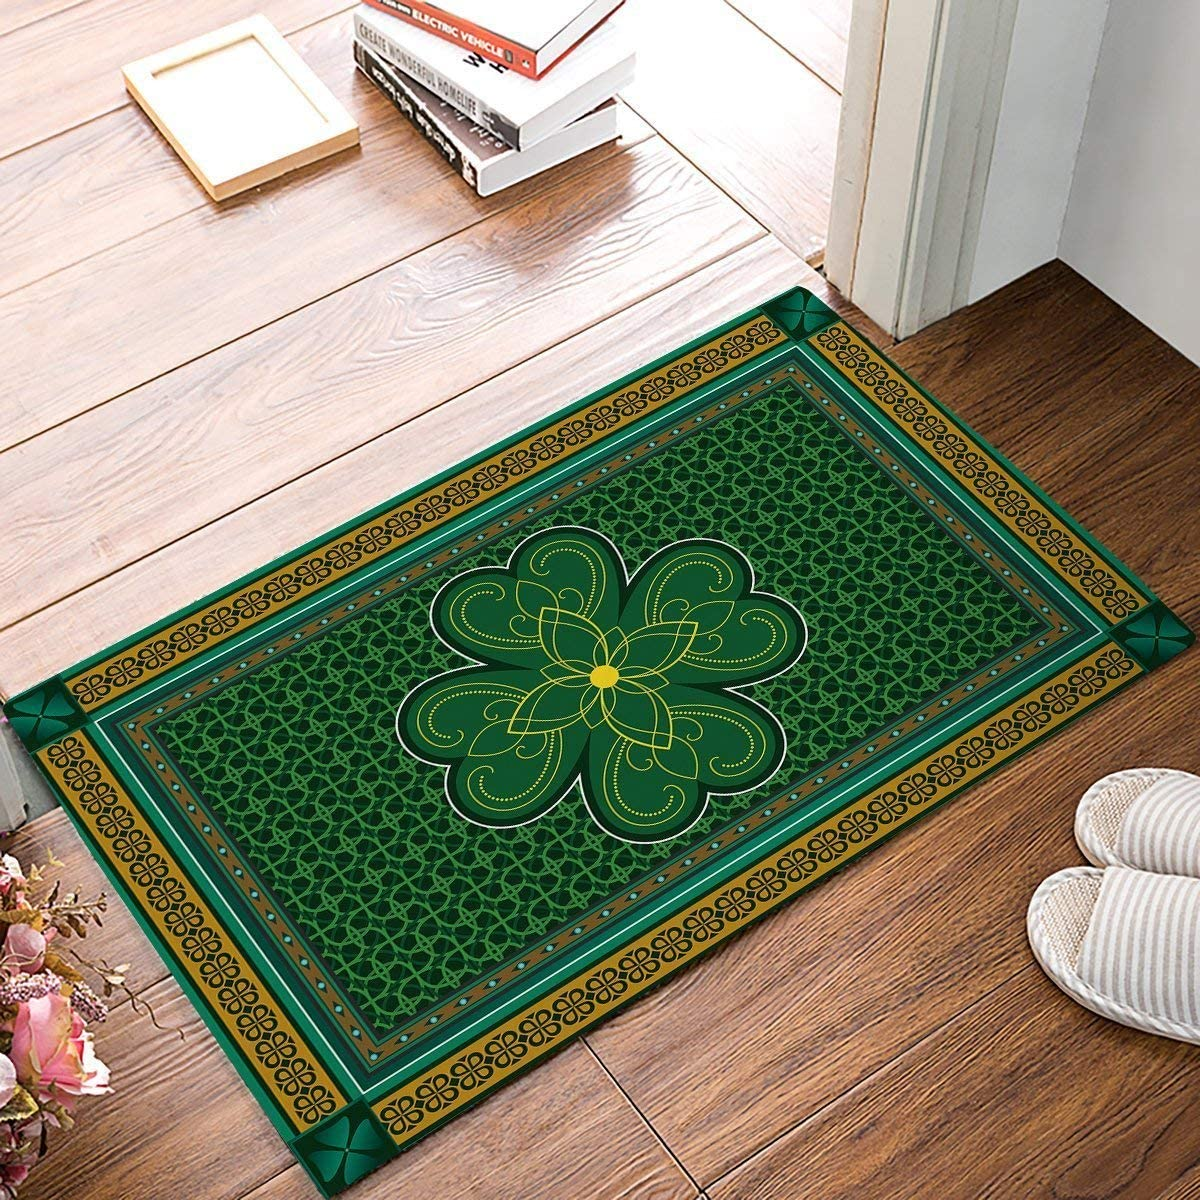 Picpeak Doormats Non-Slip Rugs Floor Carpet Keeps Your Floors Clean – Traditional Shamrock Irish Decorations Design Non-Slip Mat 18x30inch